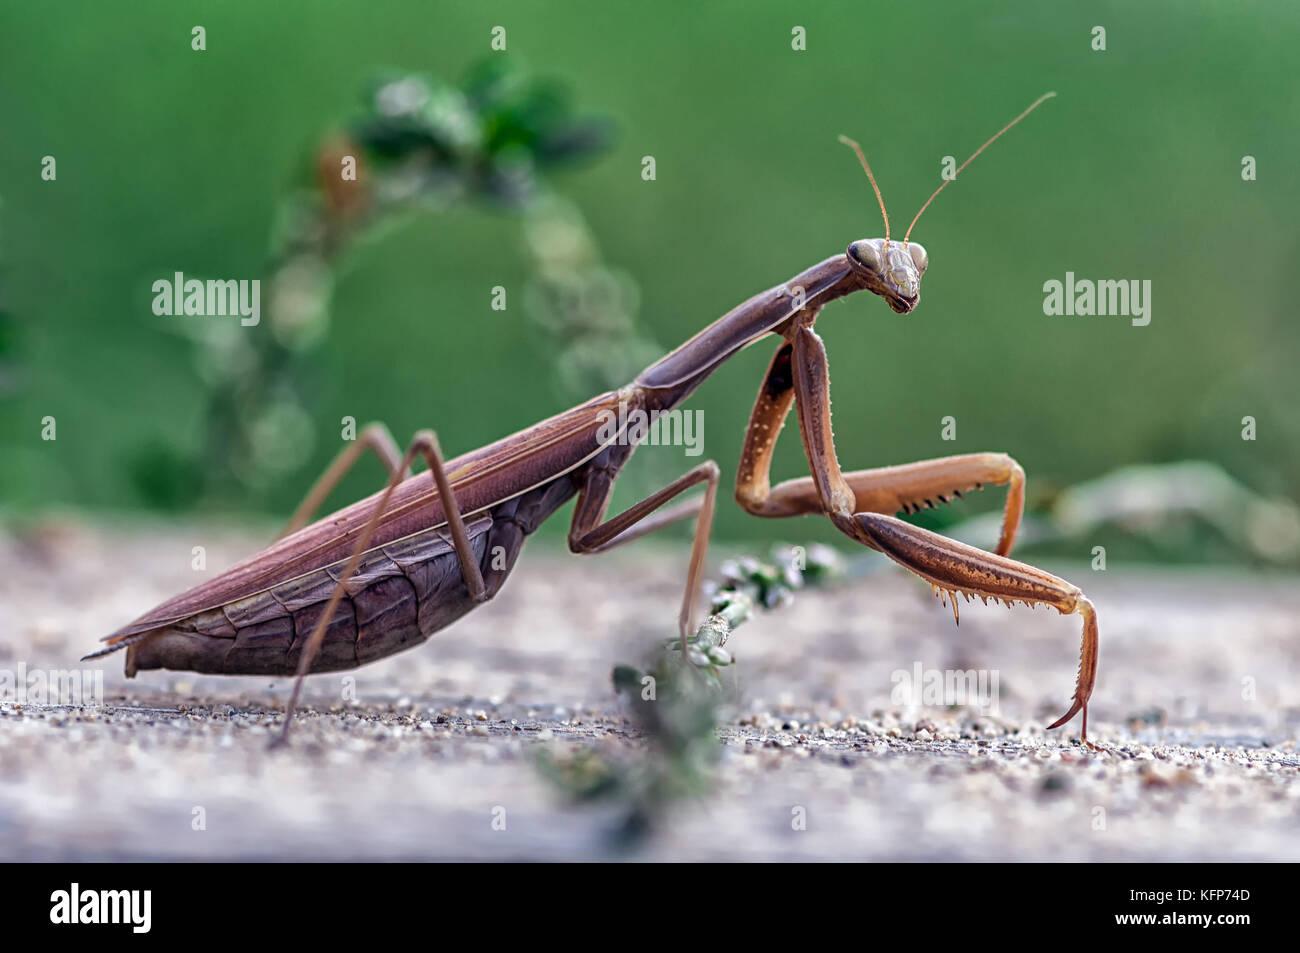 Closeup of a Praying Mantis or the European mantis. Shallow depth of field. - Stock Image